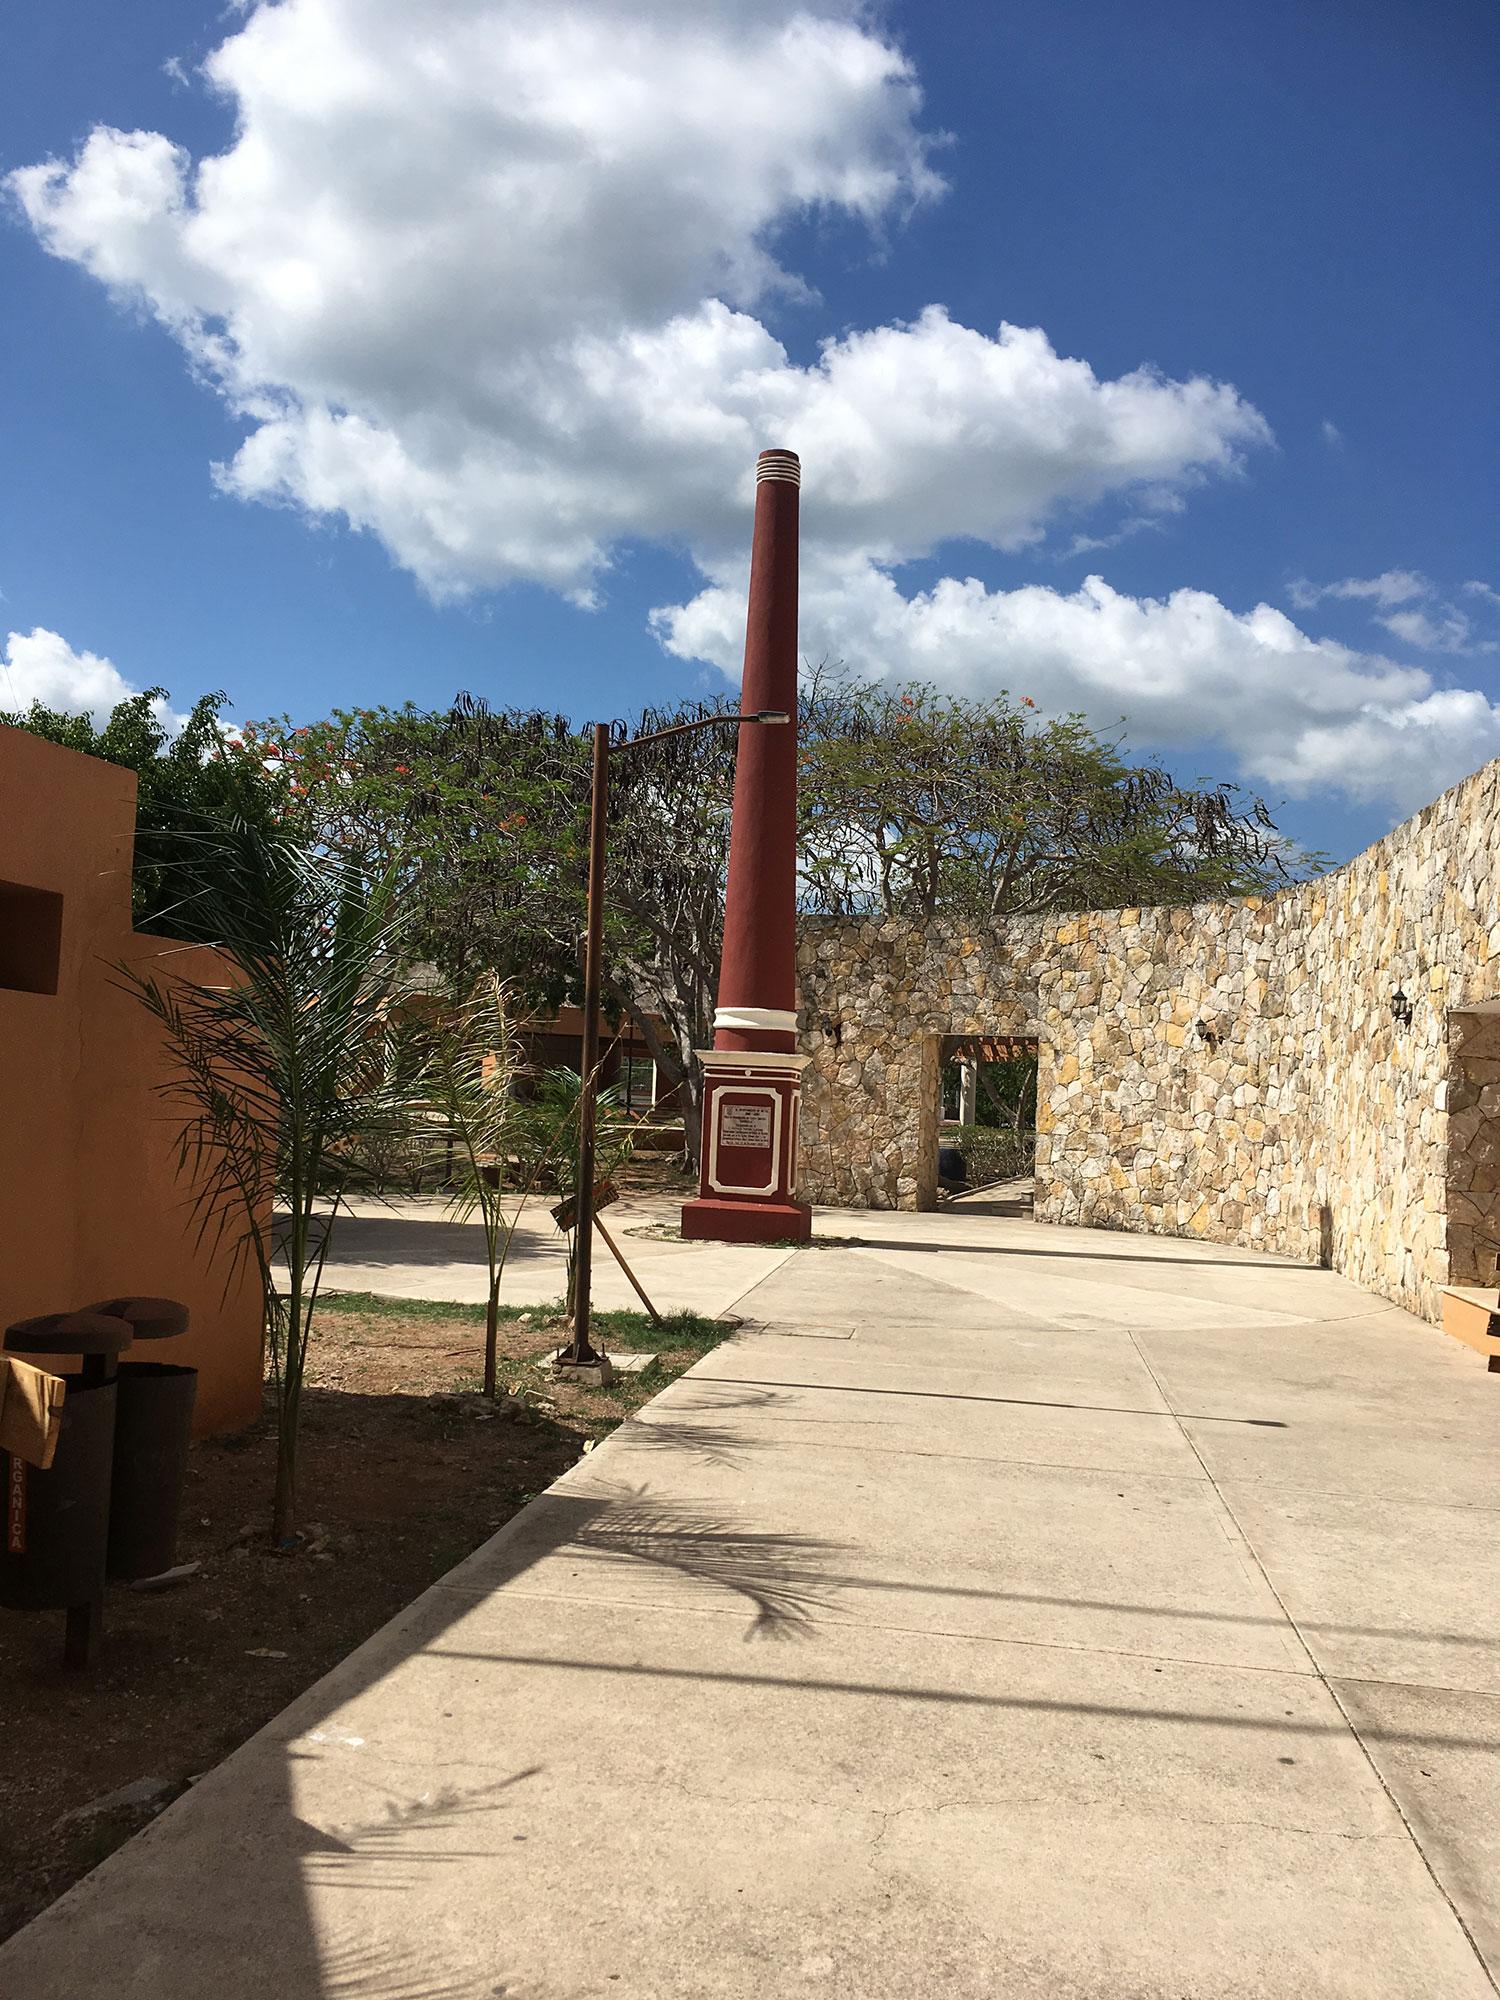 The hacienda chimney at the cenote Sambulá, a former hacienda land.